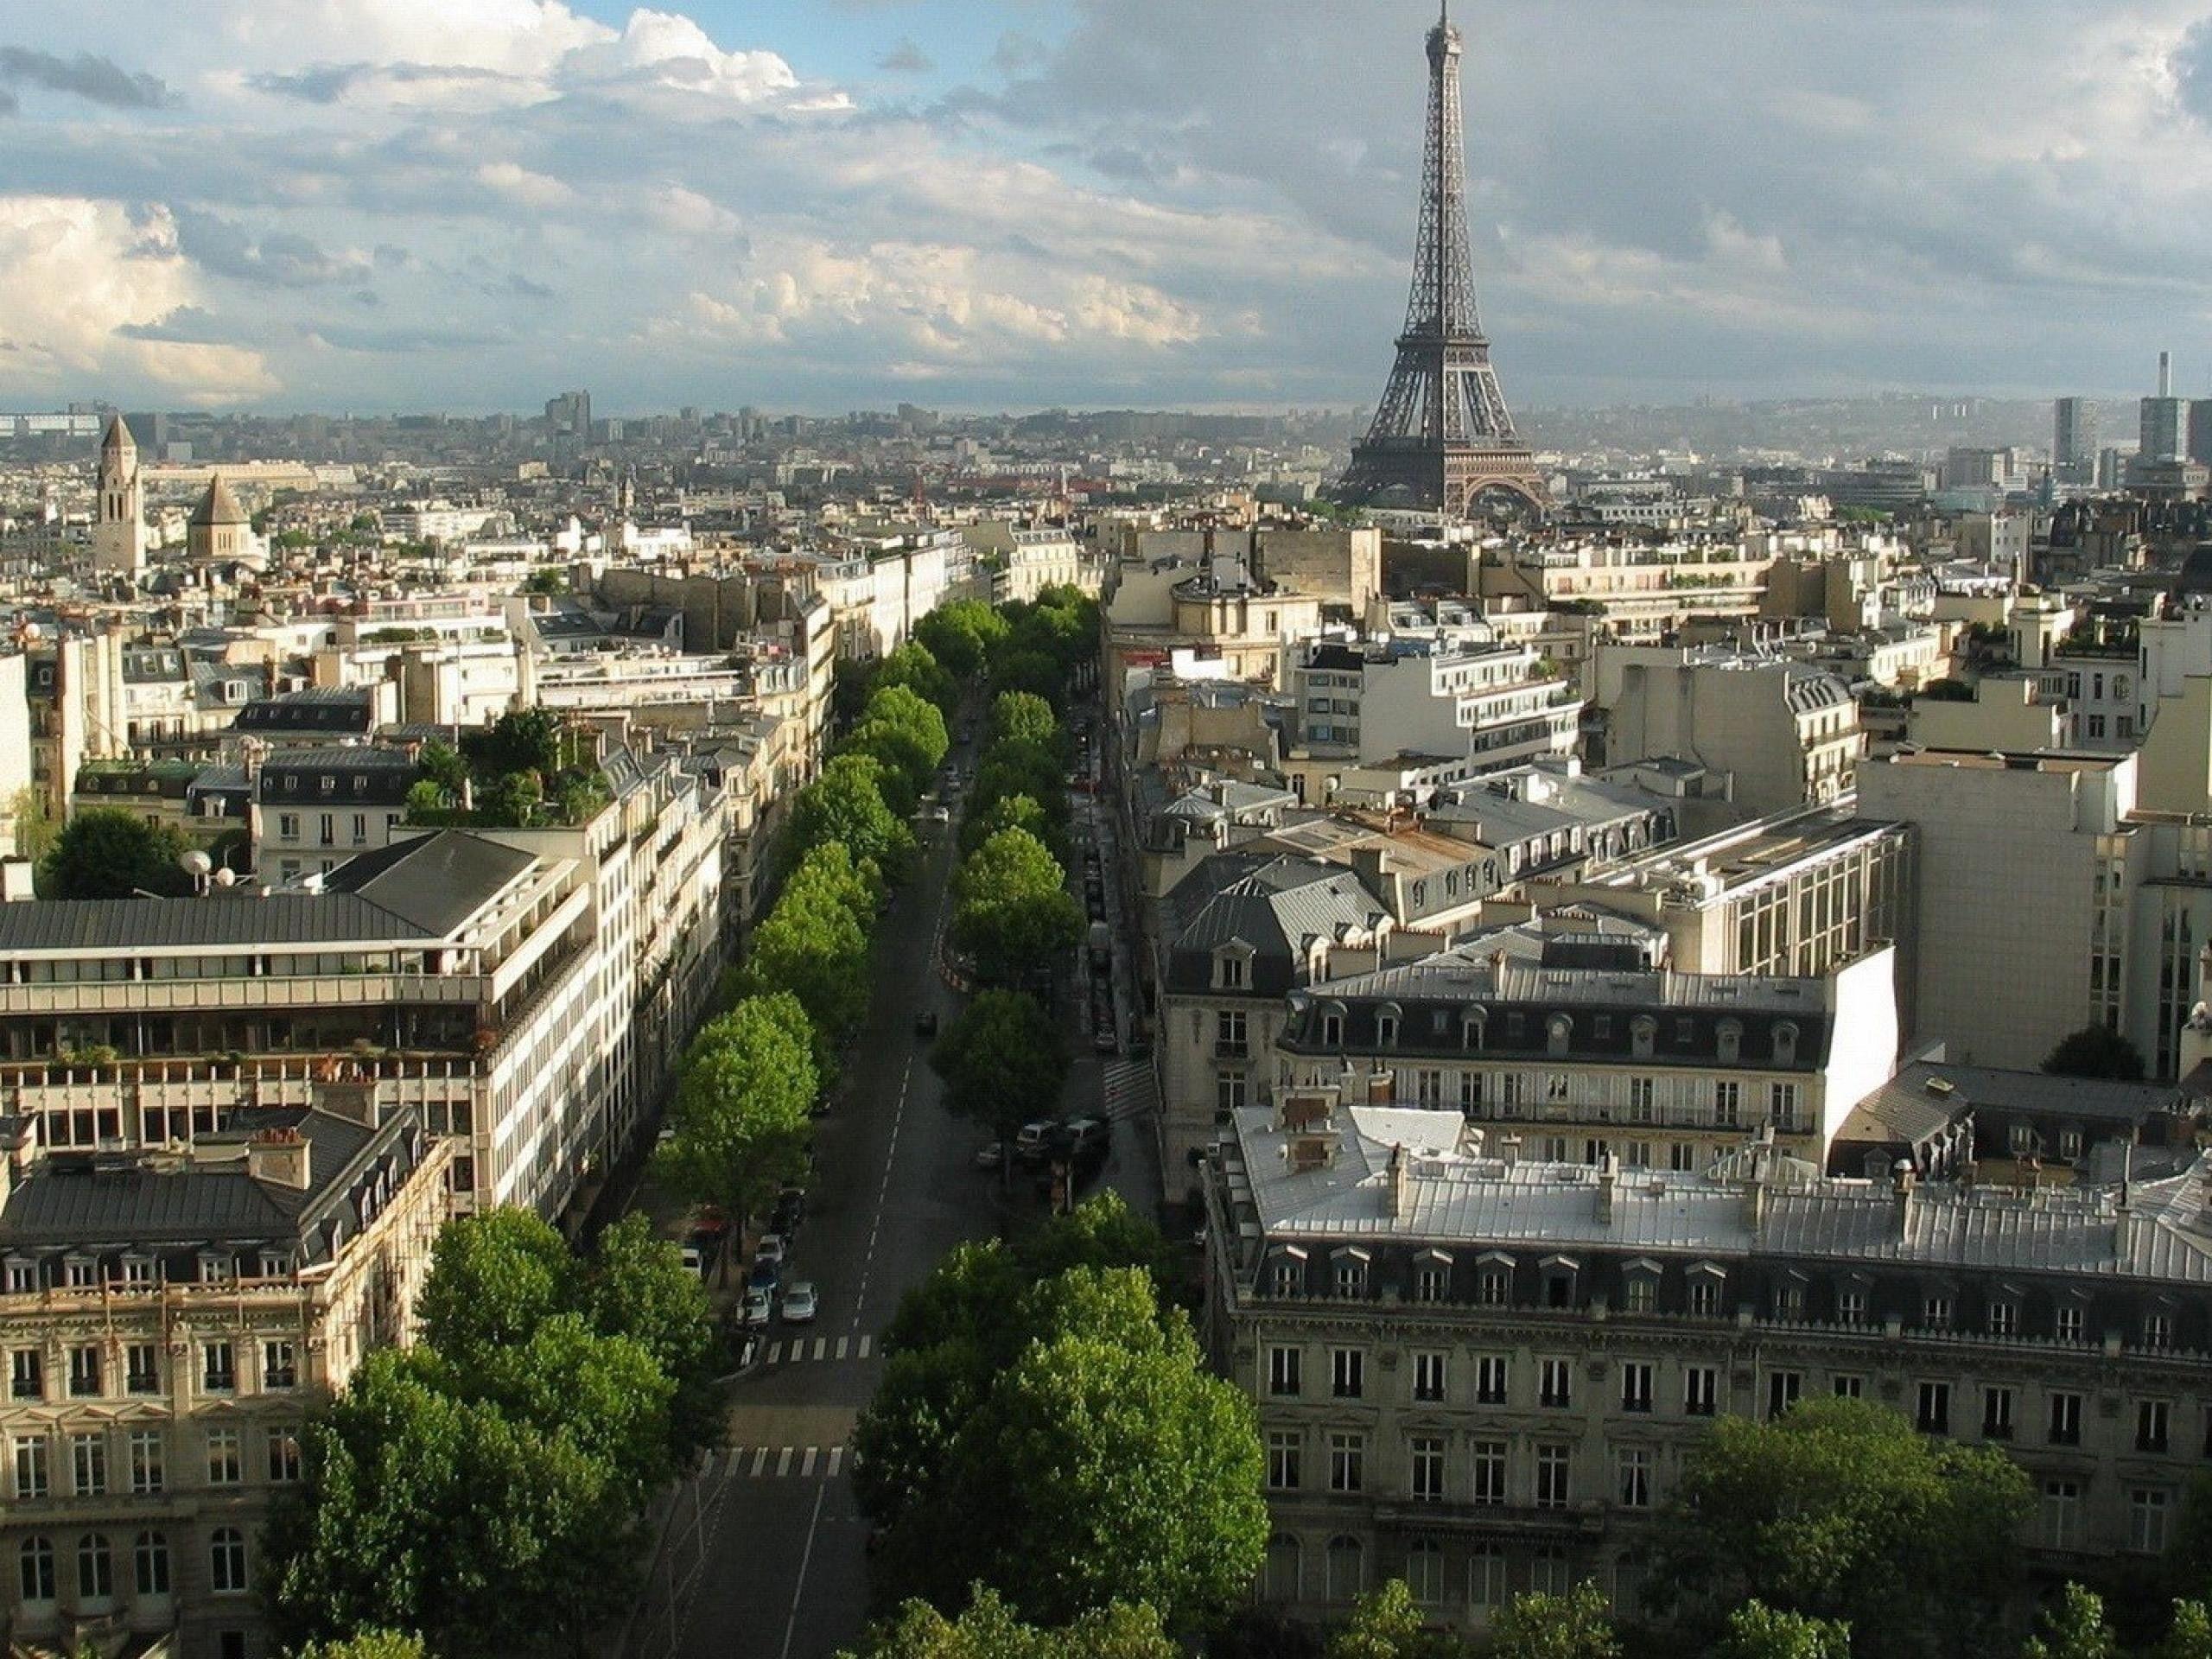 France landscape (2560x1920, landscape)  via www.allwallpaper.in